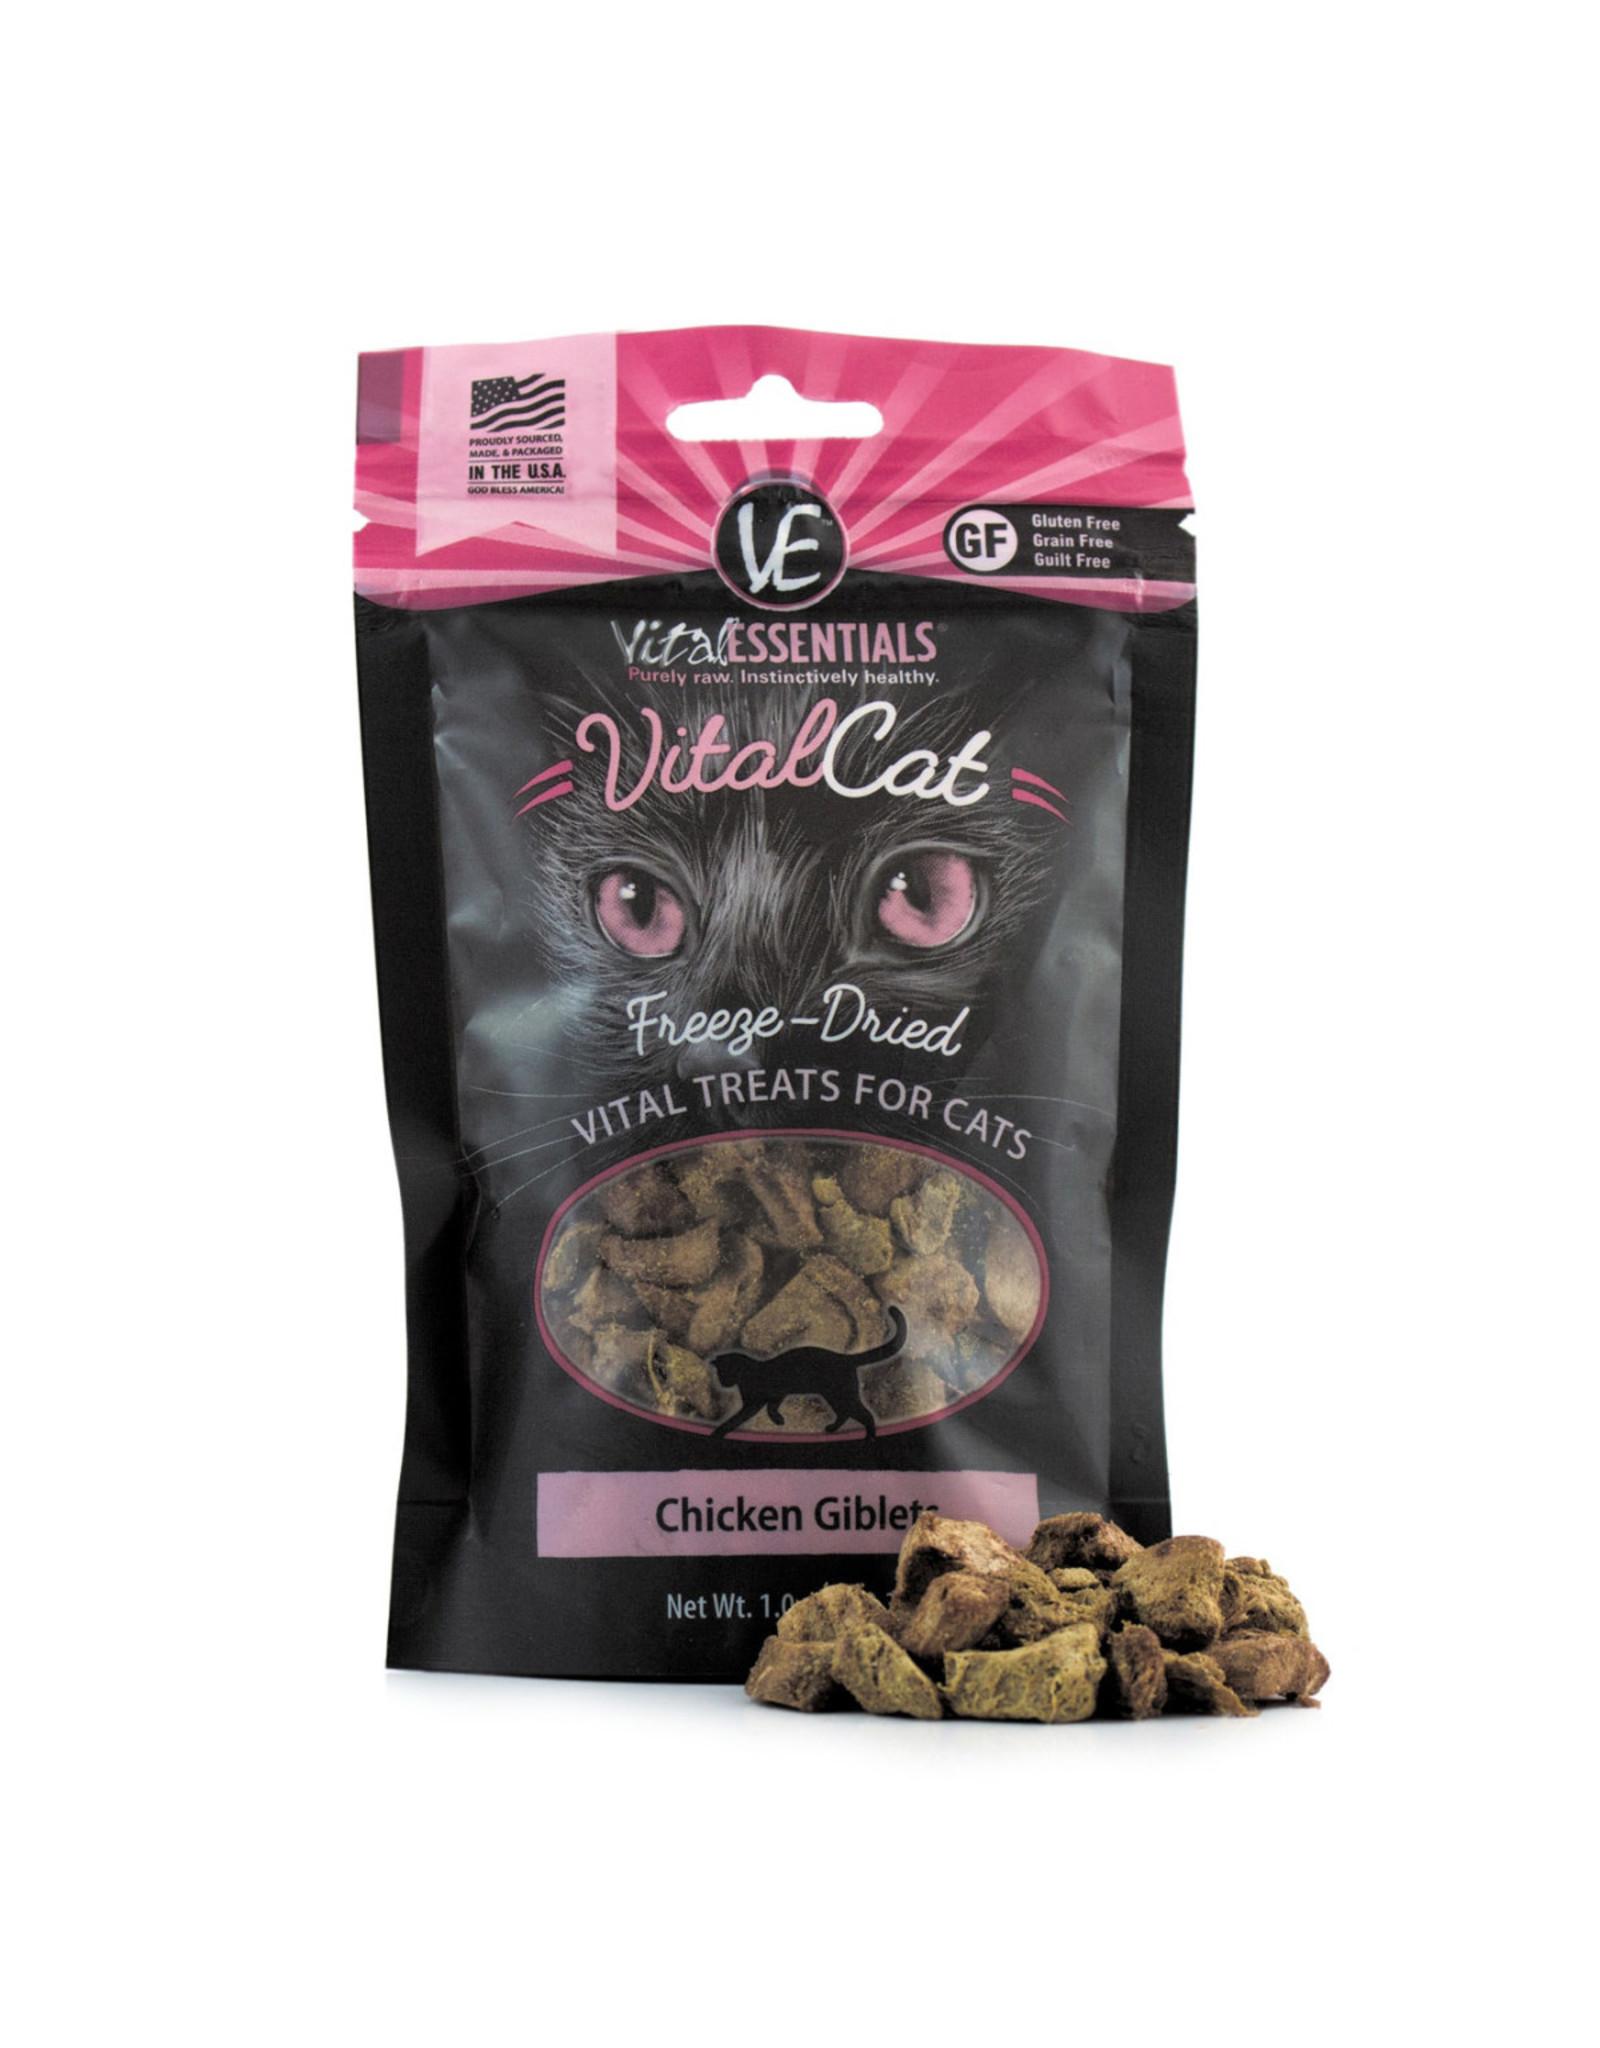 Vital Essentials VITAL CAT FREEZE-DRIED CHICKEN GIBLETS TREATS 0.9OZ